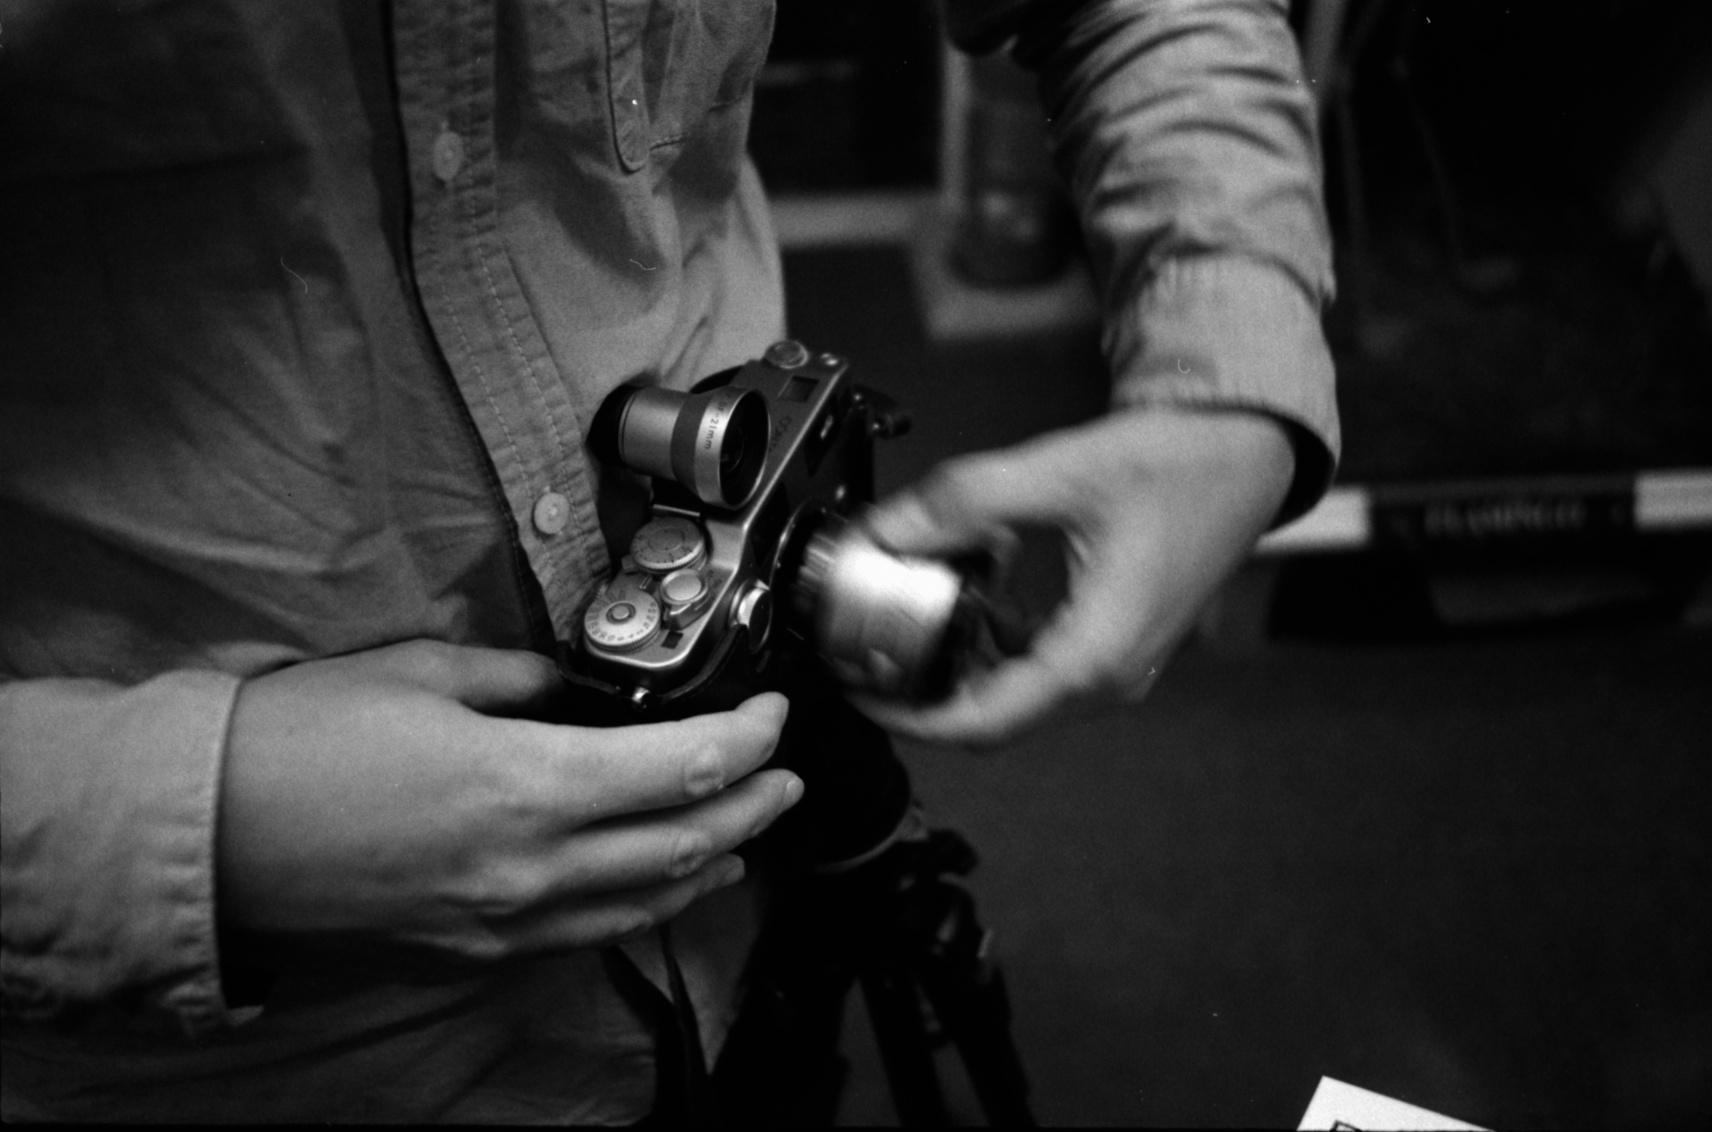 film_2012_05_03_0002.jpg